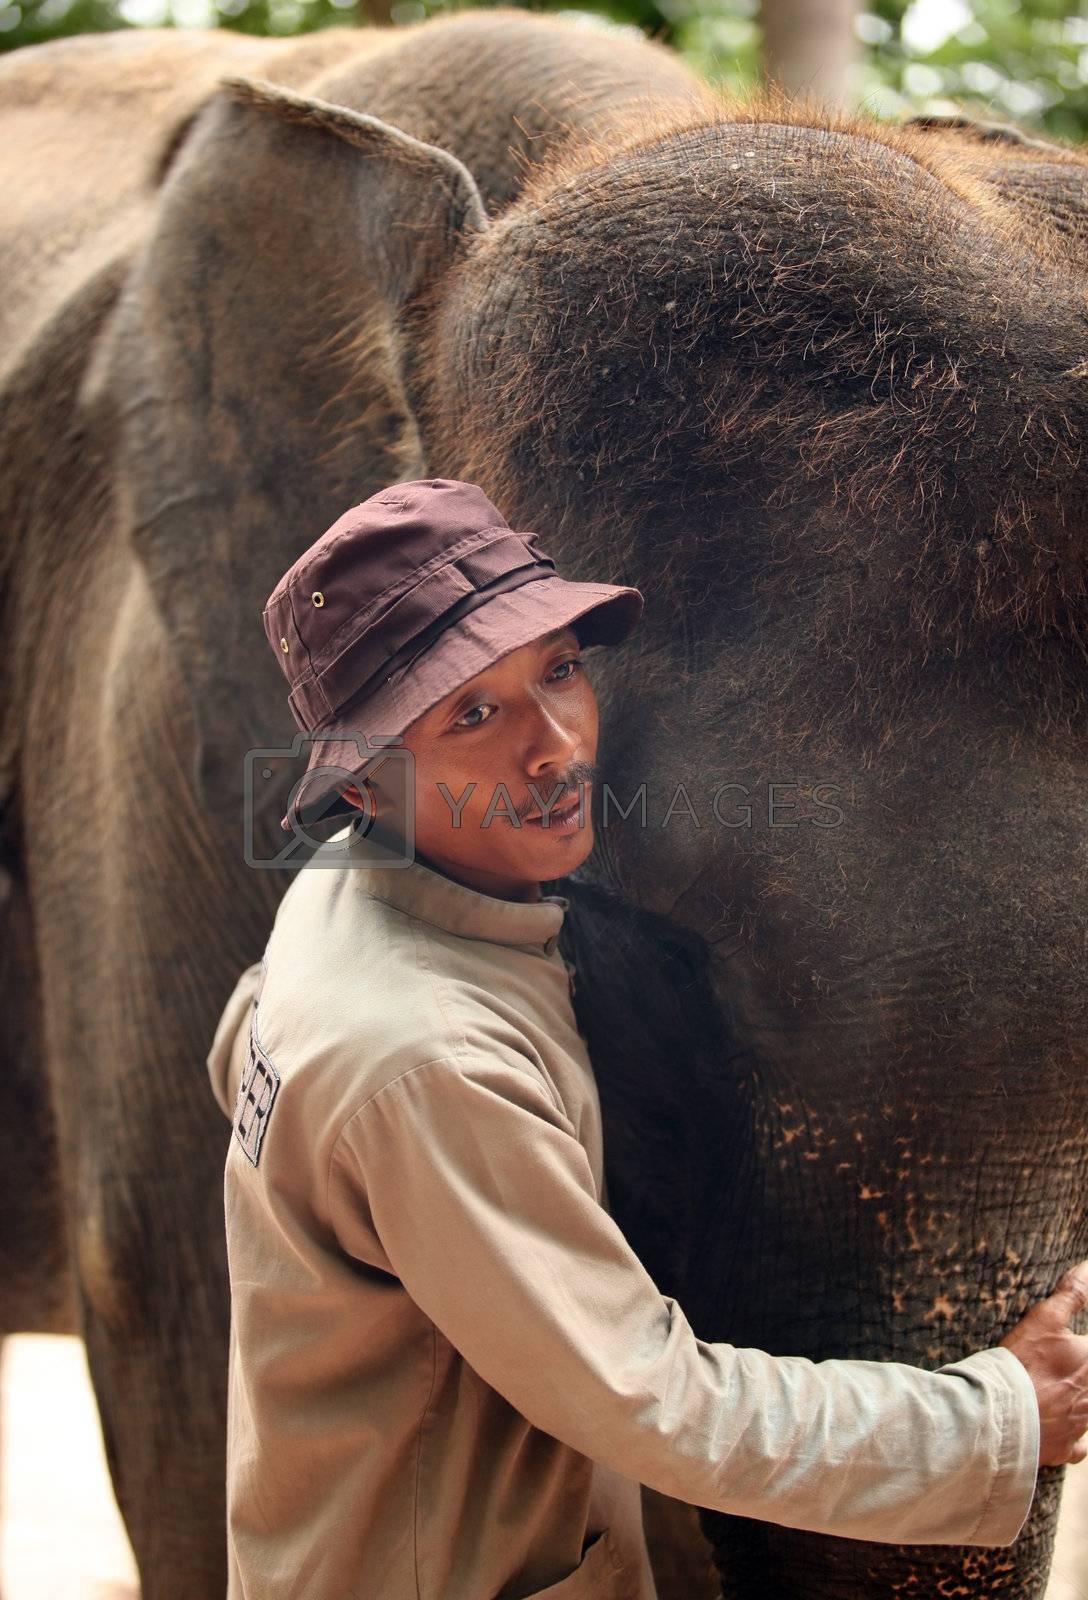 The big elephant and man. Bali zoo. Indonesia